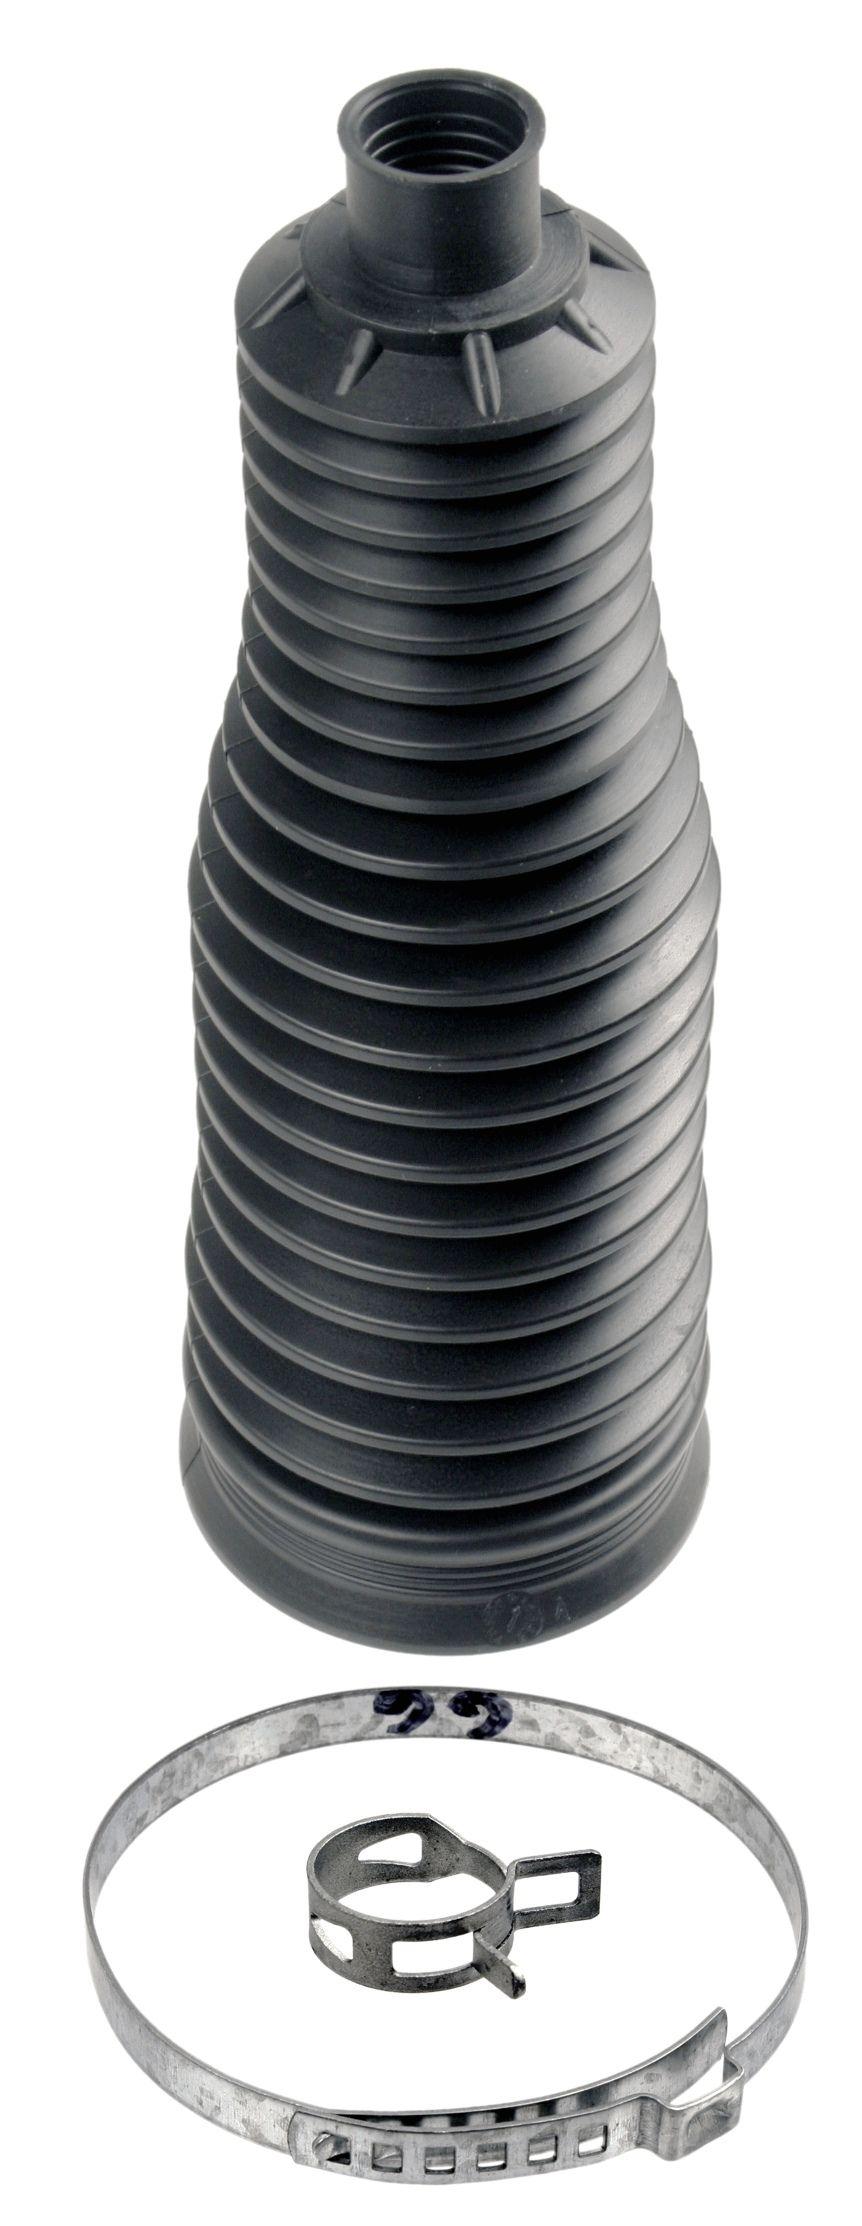 AUDI Q5 2020 Faltenbalg Lenkung - Original TRW JBE380 Innendurchmesser 2: 16mm, Innendurchmesser 2: 61mm